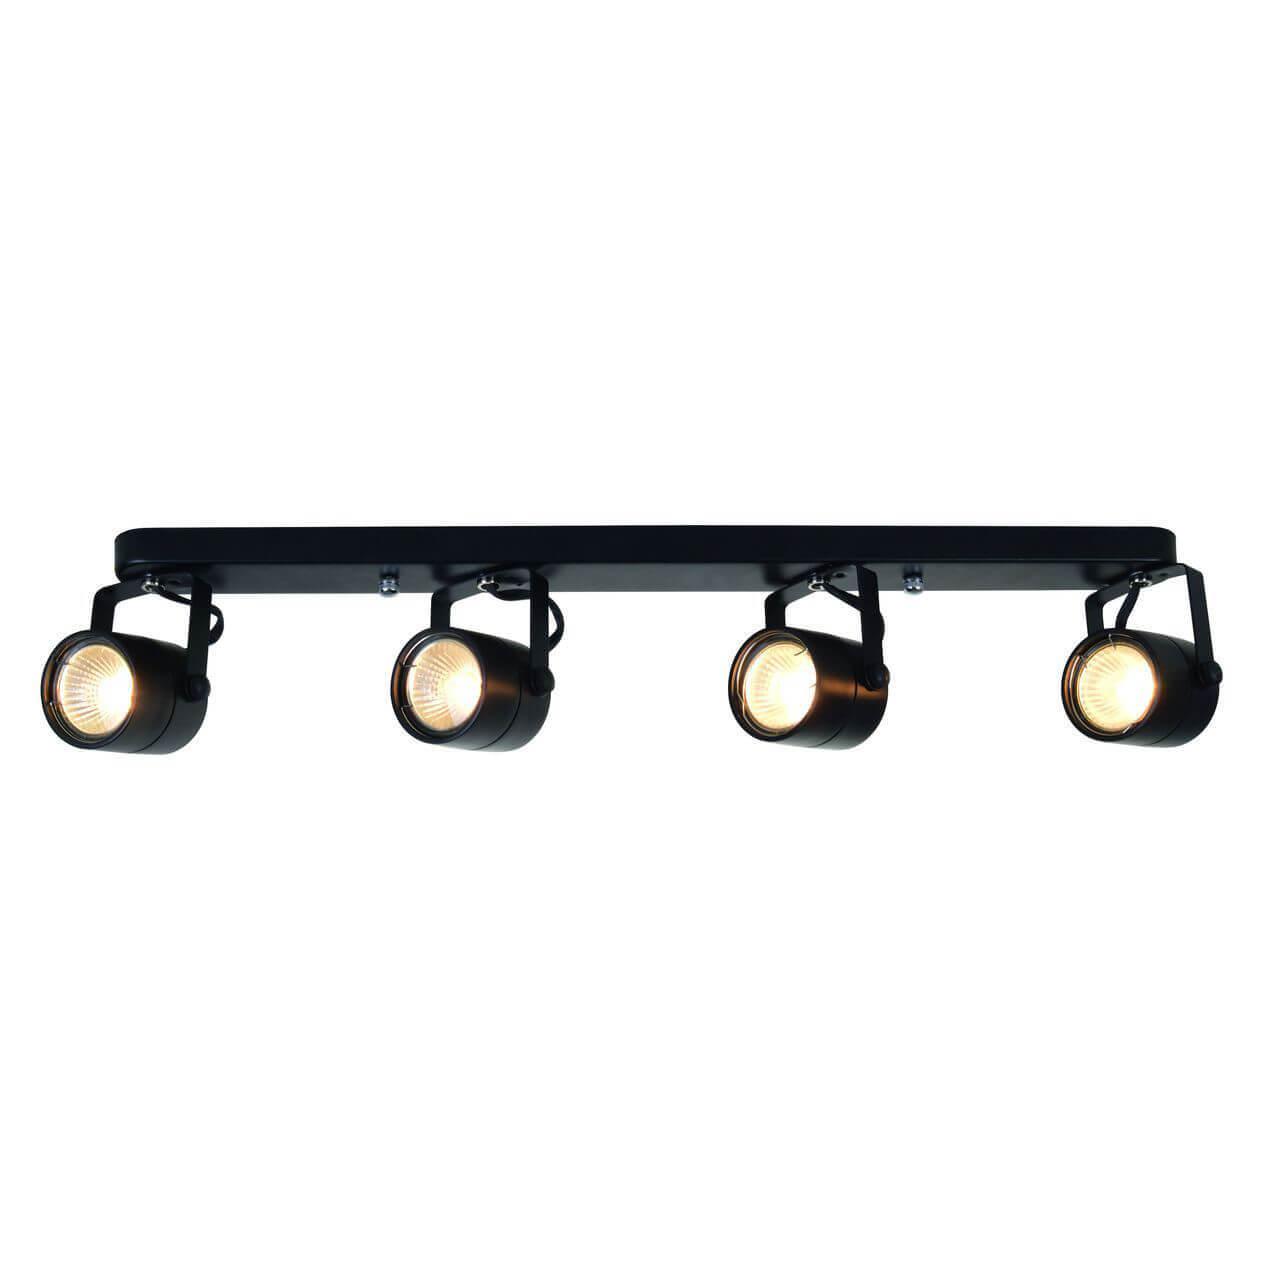 Спот Arte Lamp A1310PL-4BK Lente Black недорого